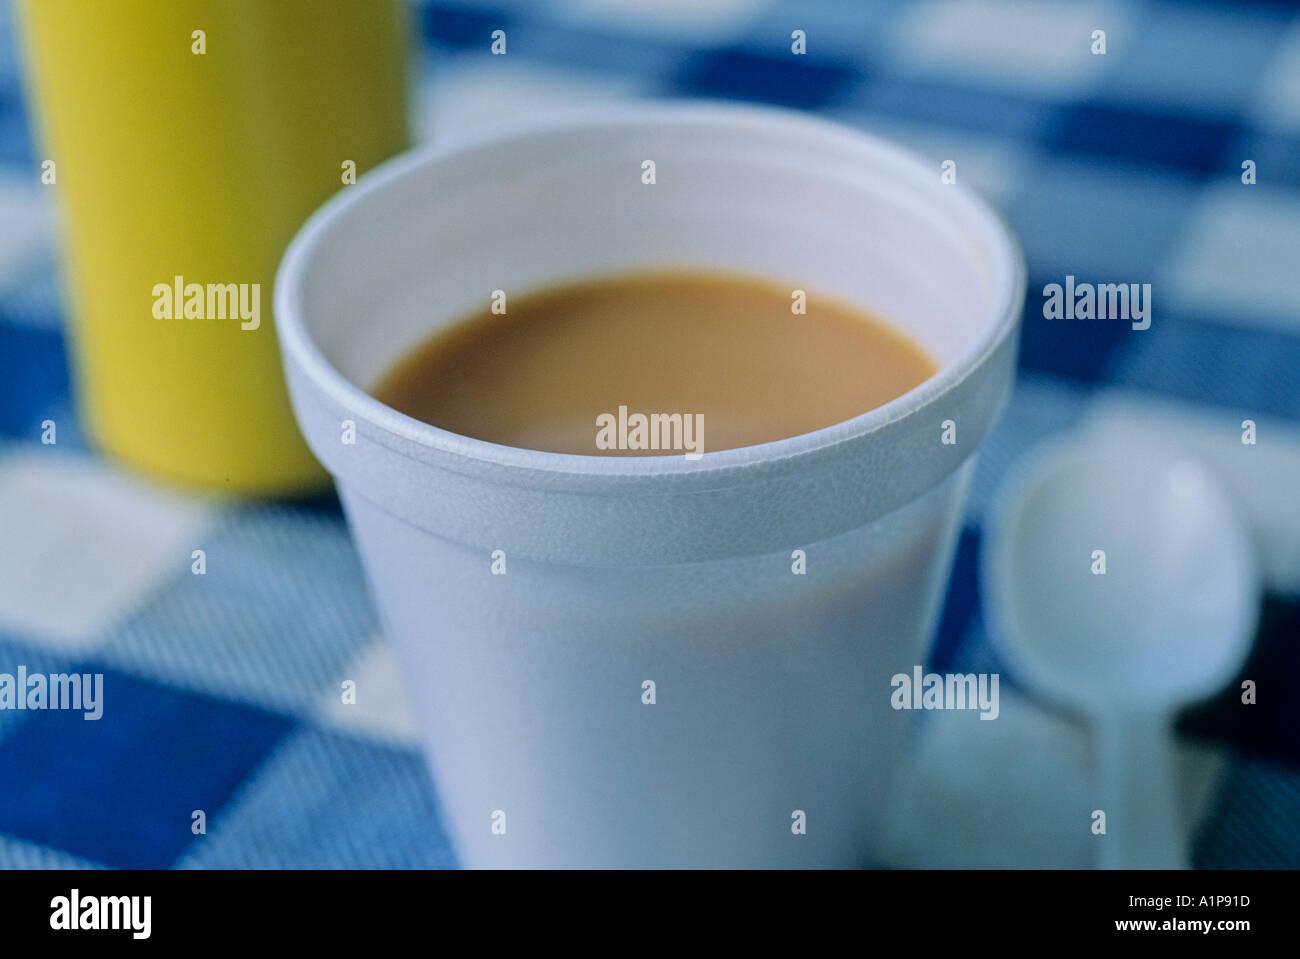 styrofoam cup stock photos styrofoam cup stock images alamy